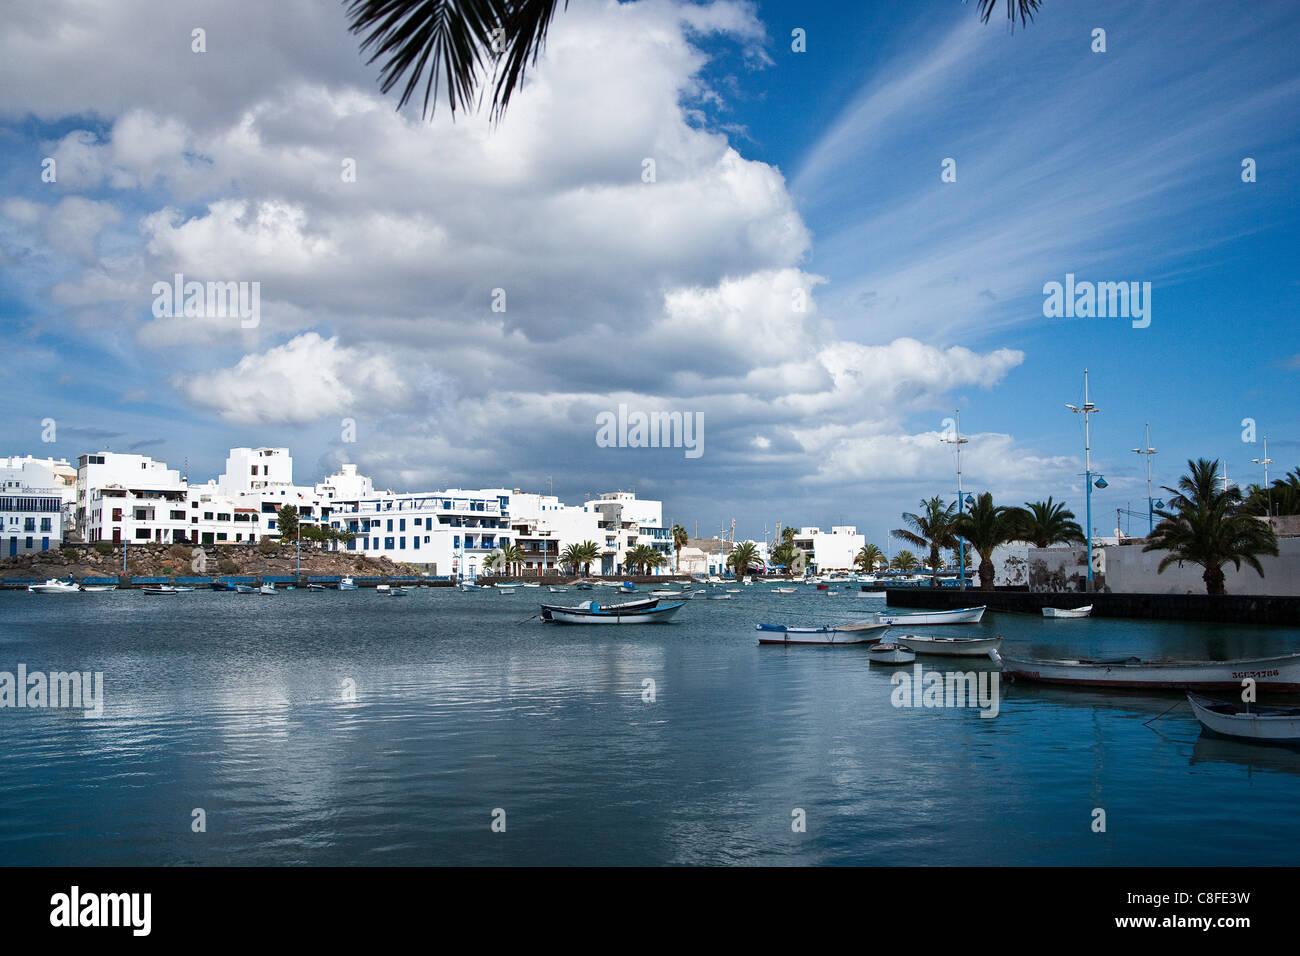 Arrecife, Atlantic, boat, Charco de San Gines, Spain, Europe, fishing boat, harbour, port, harbour arrangement, - Stock Image